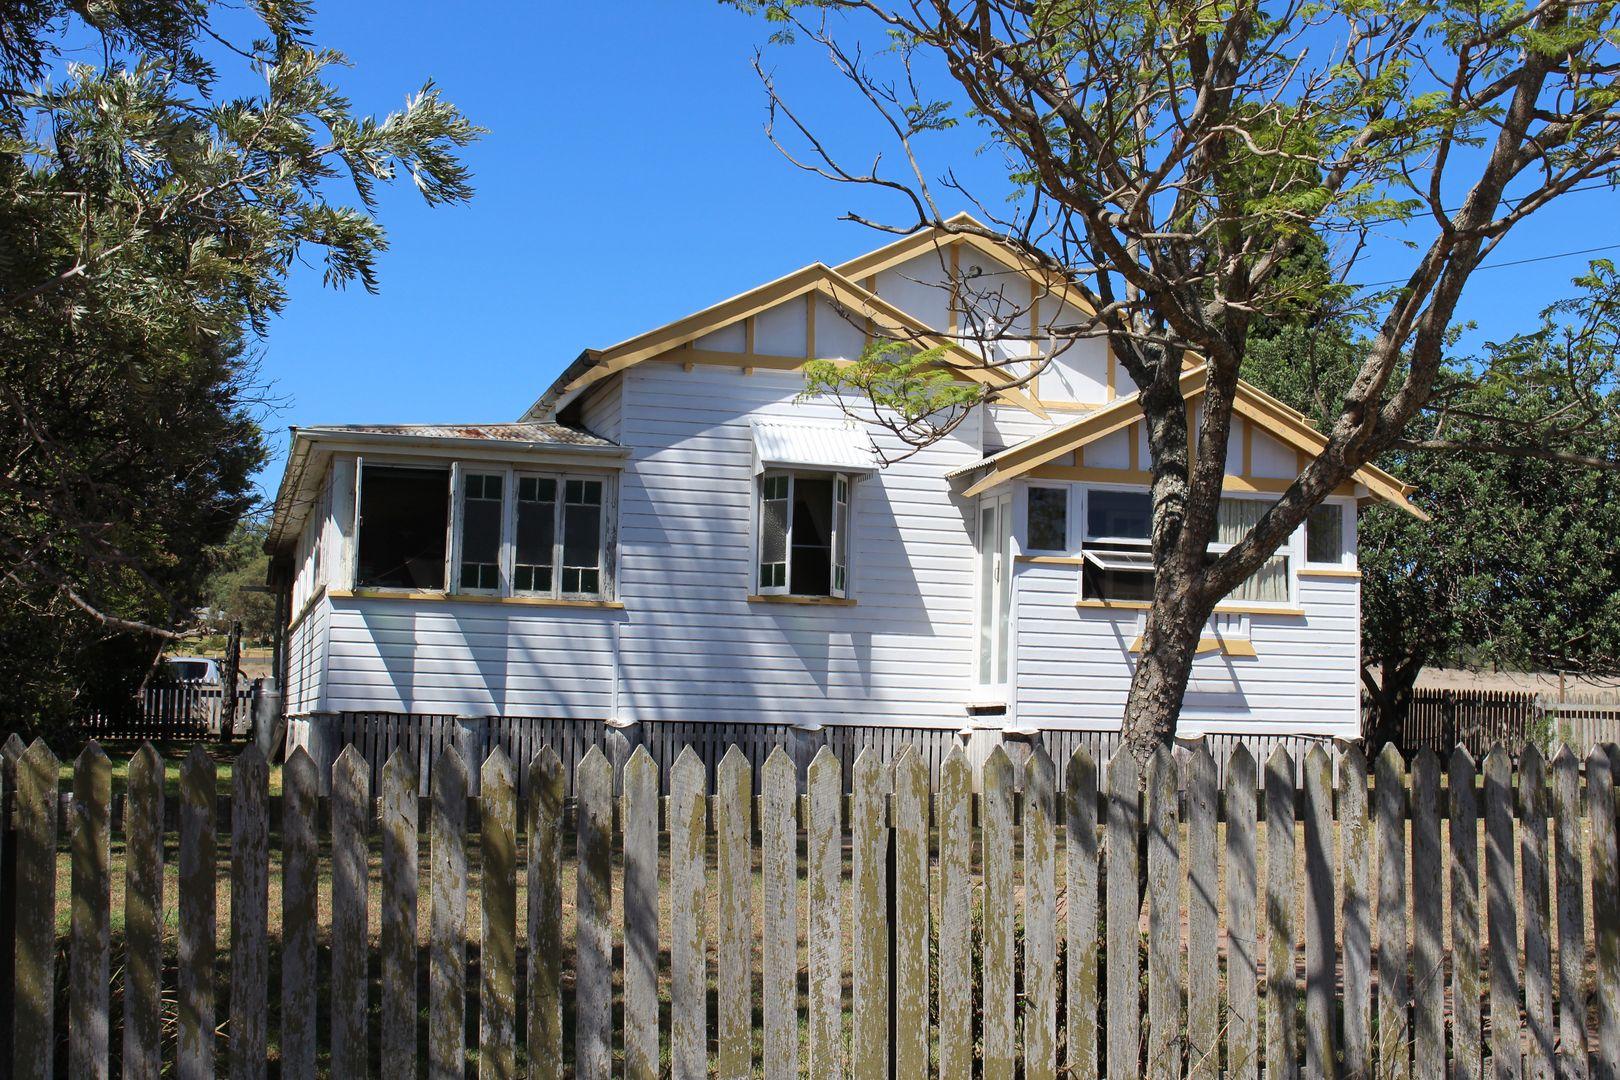 0 Kingsthorpe-Haden Rd, Goombungee QLD 4354, Image 2